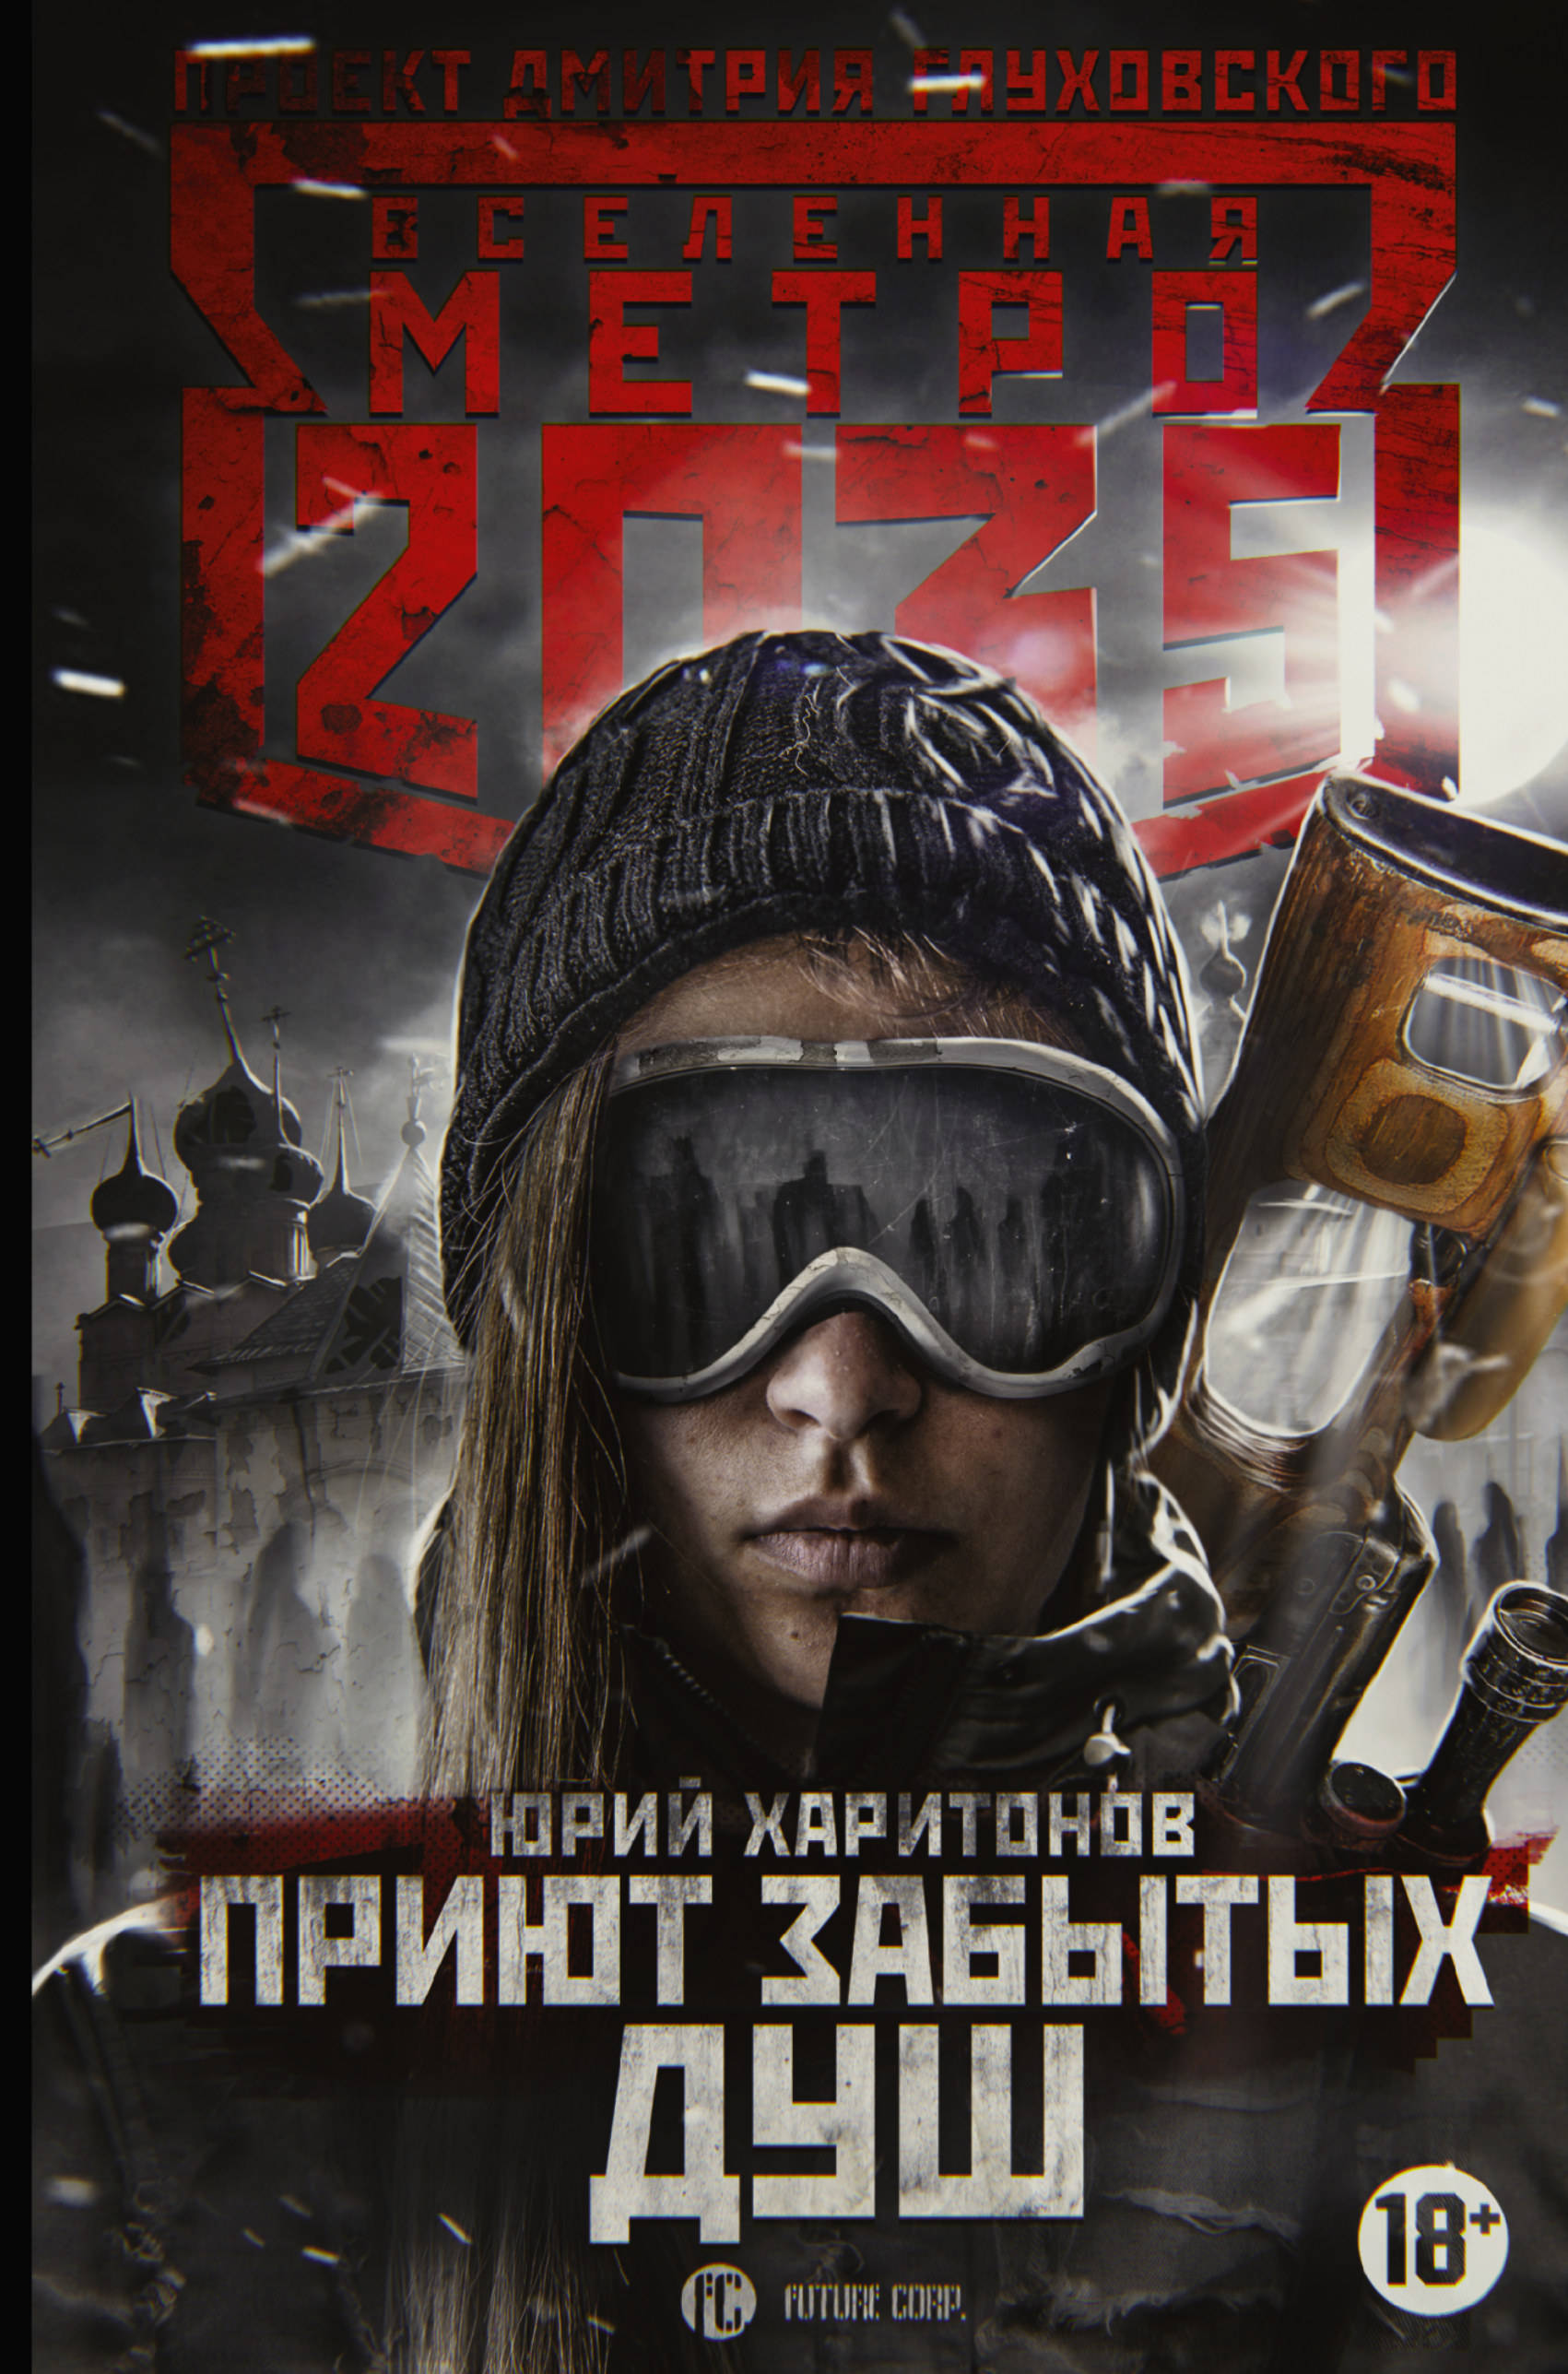 «Метро 2035: Приют забытых душ» Юрий Харитонов